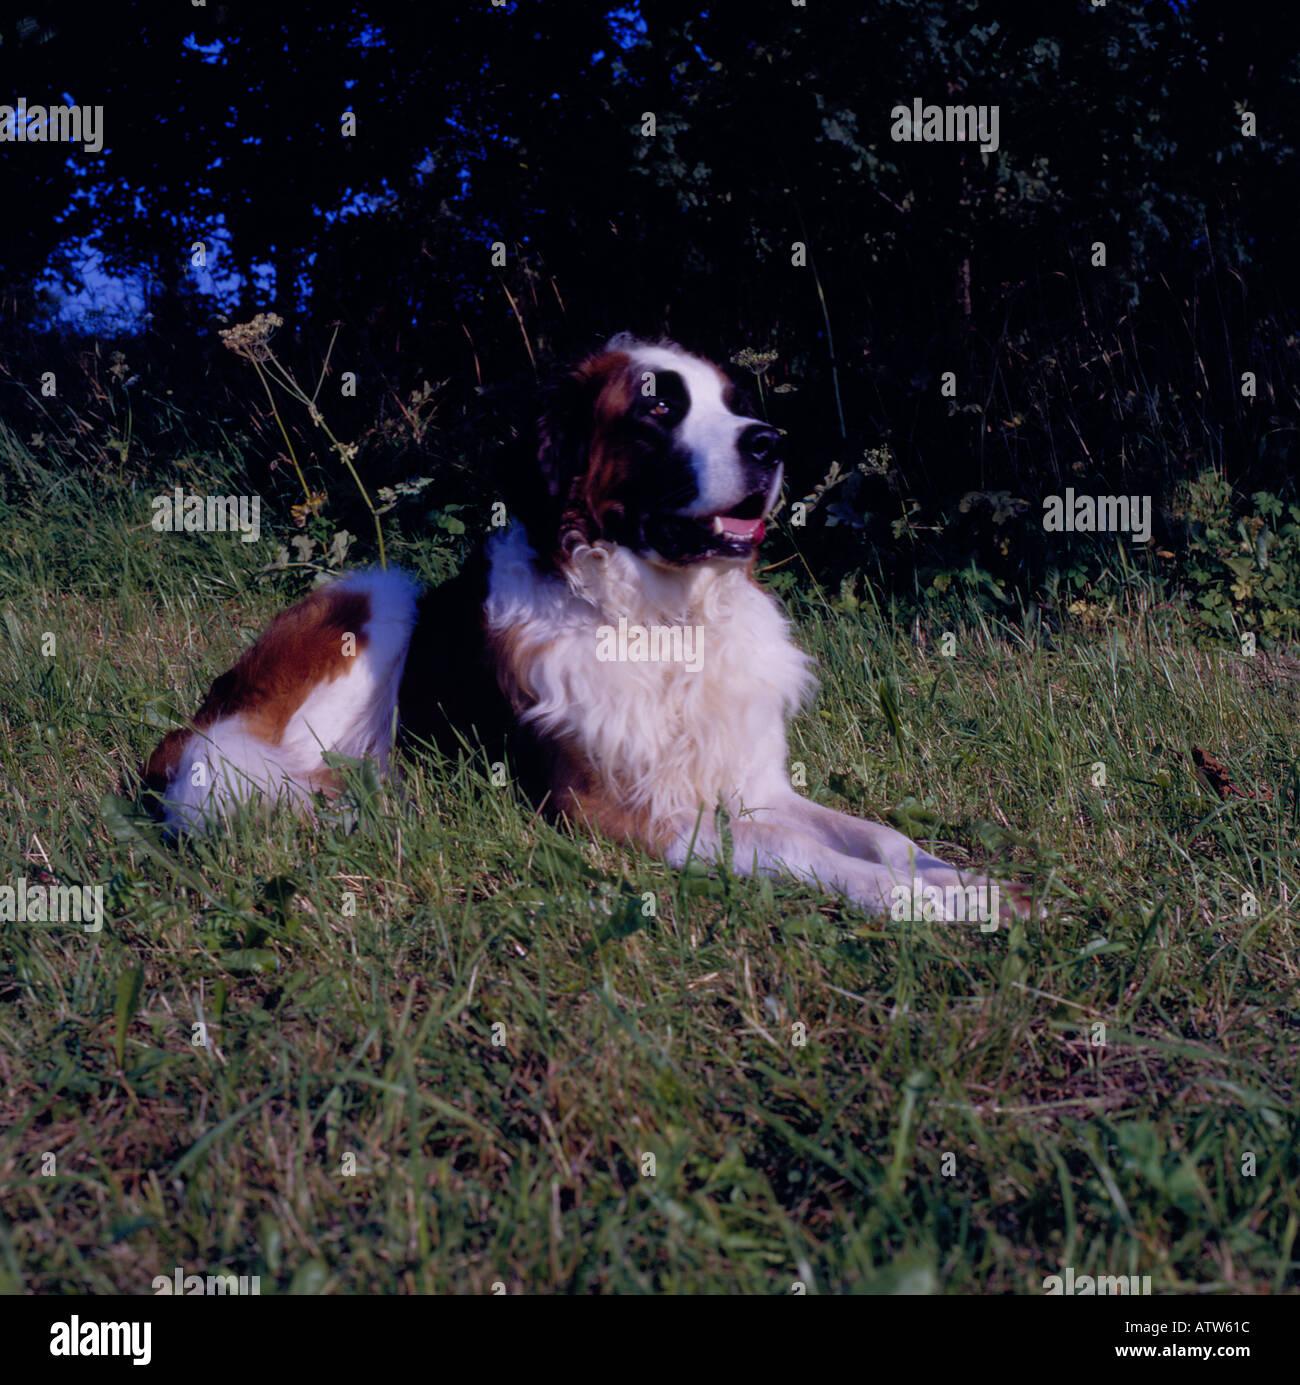 Bernhardiner sitting in grass. Photo by Willy Matheisl - Stock Image